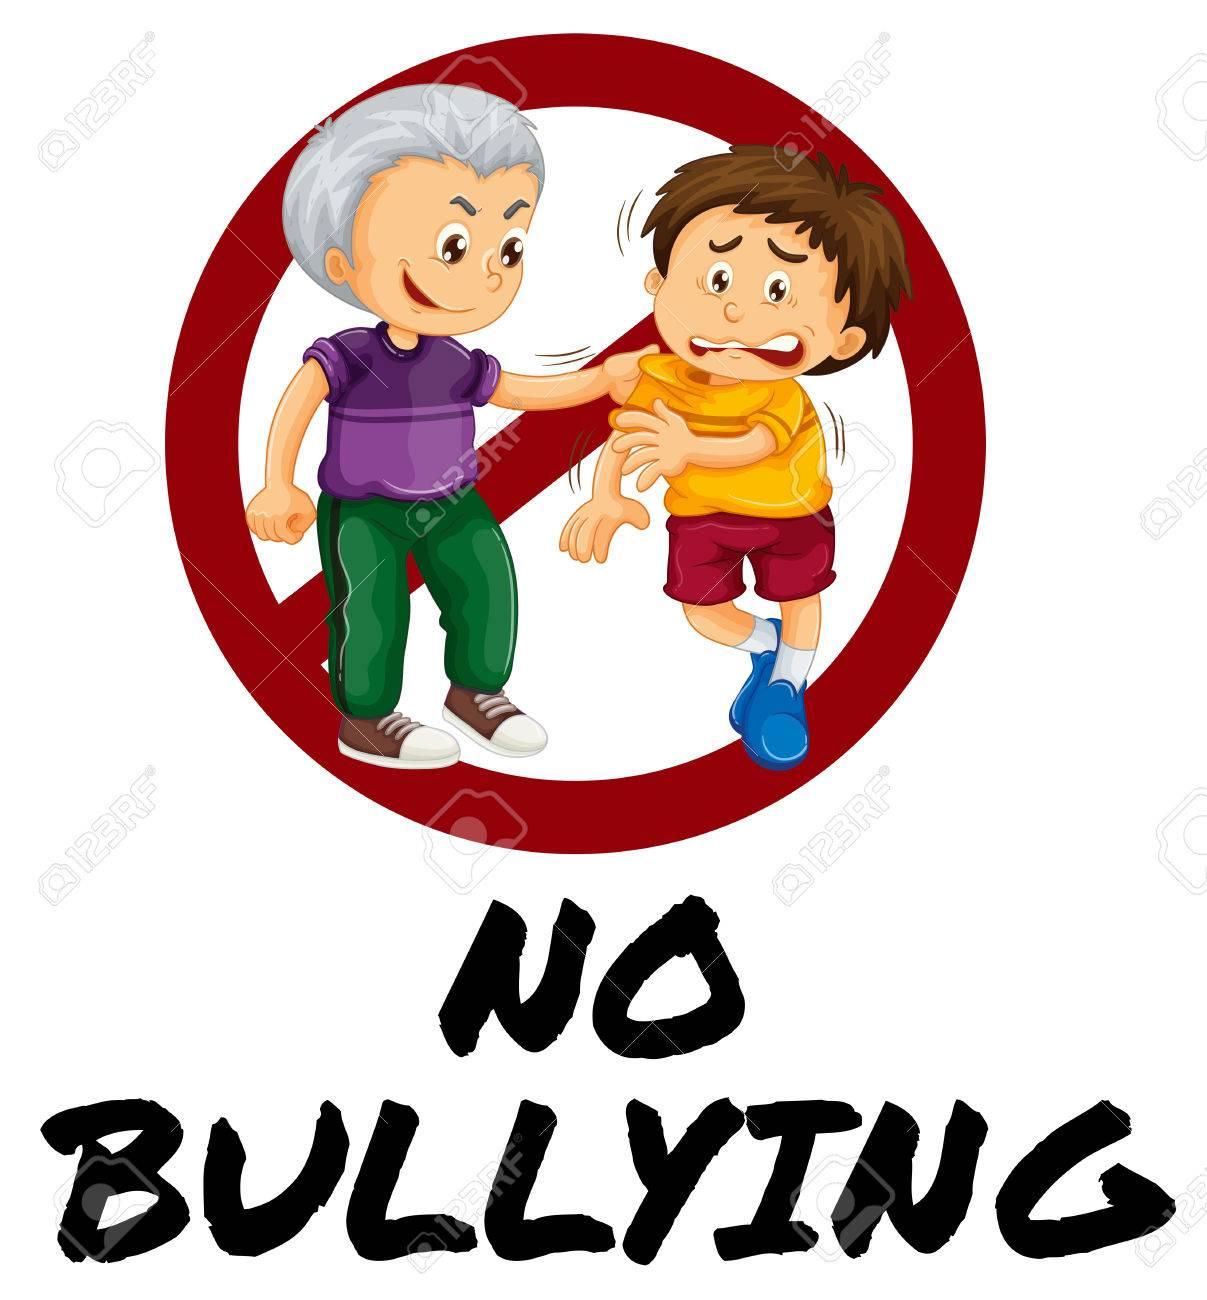 sign warning for no bullying illustration royalty free cliparts